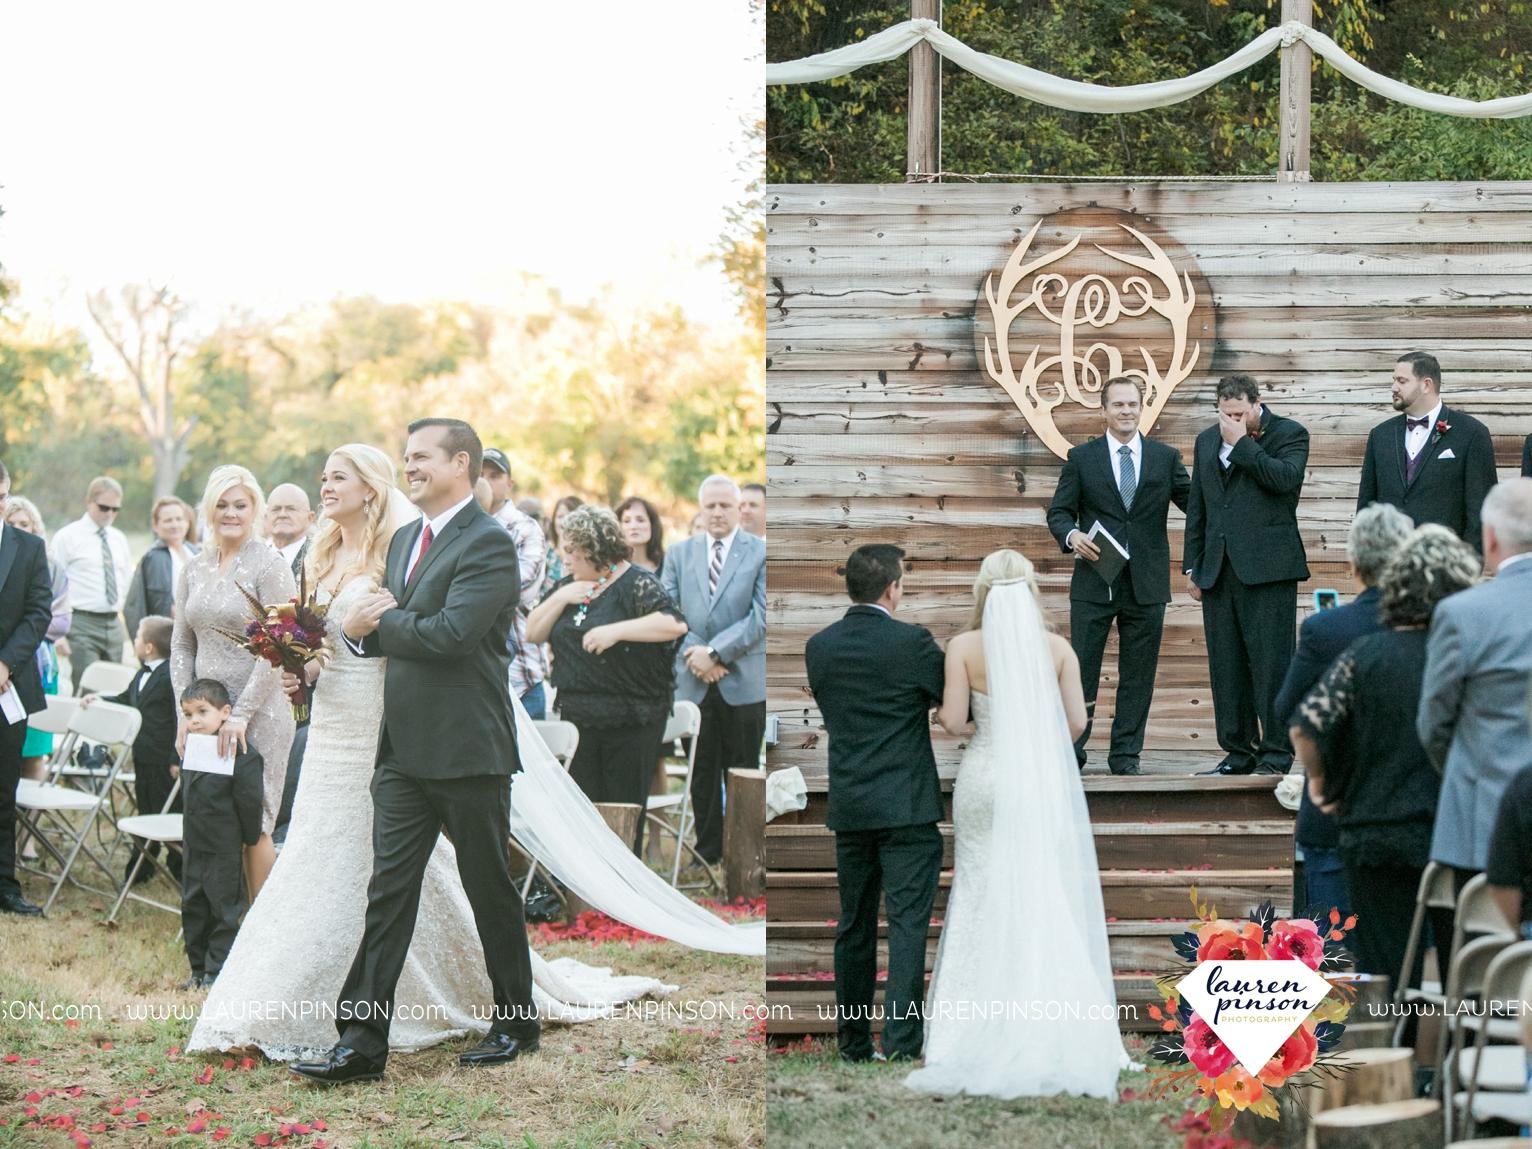 rustic-wichita-falls-texas-wedding-photographer-gold-glam-mayfield-events-market-street-united-allue-bridals-fall_1678.jpg